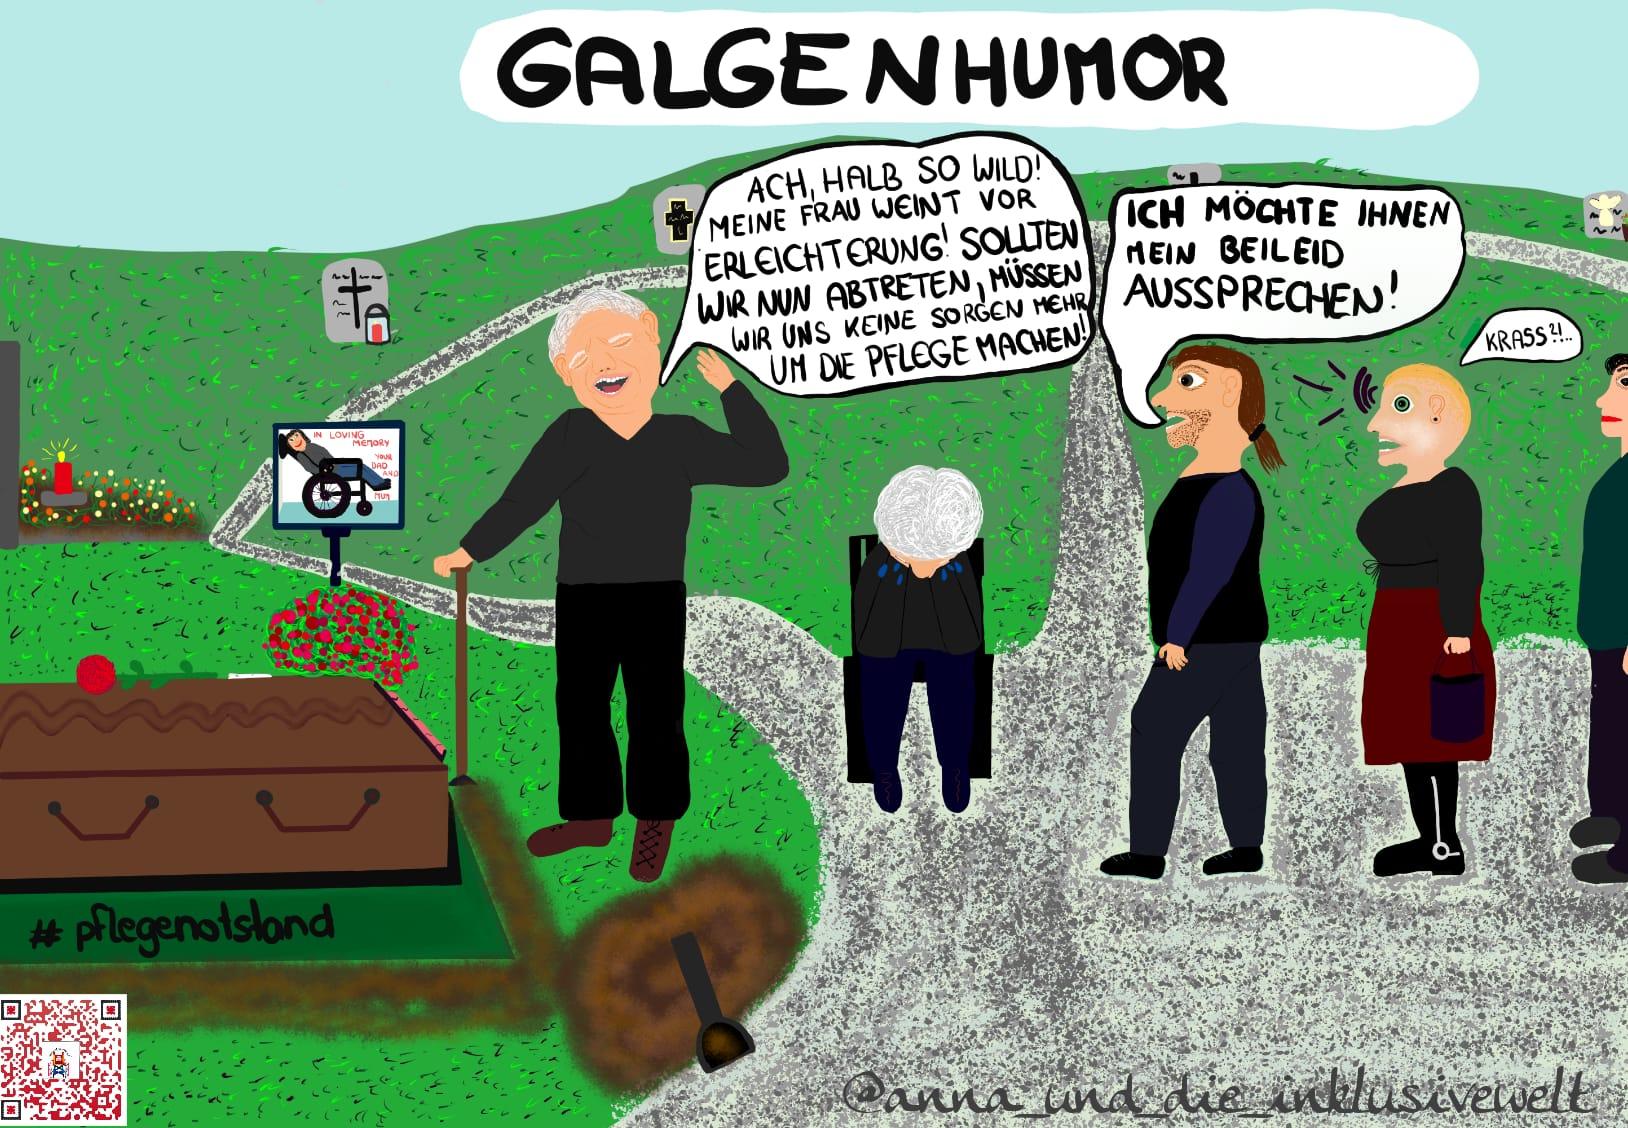 Galagenhumor